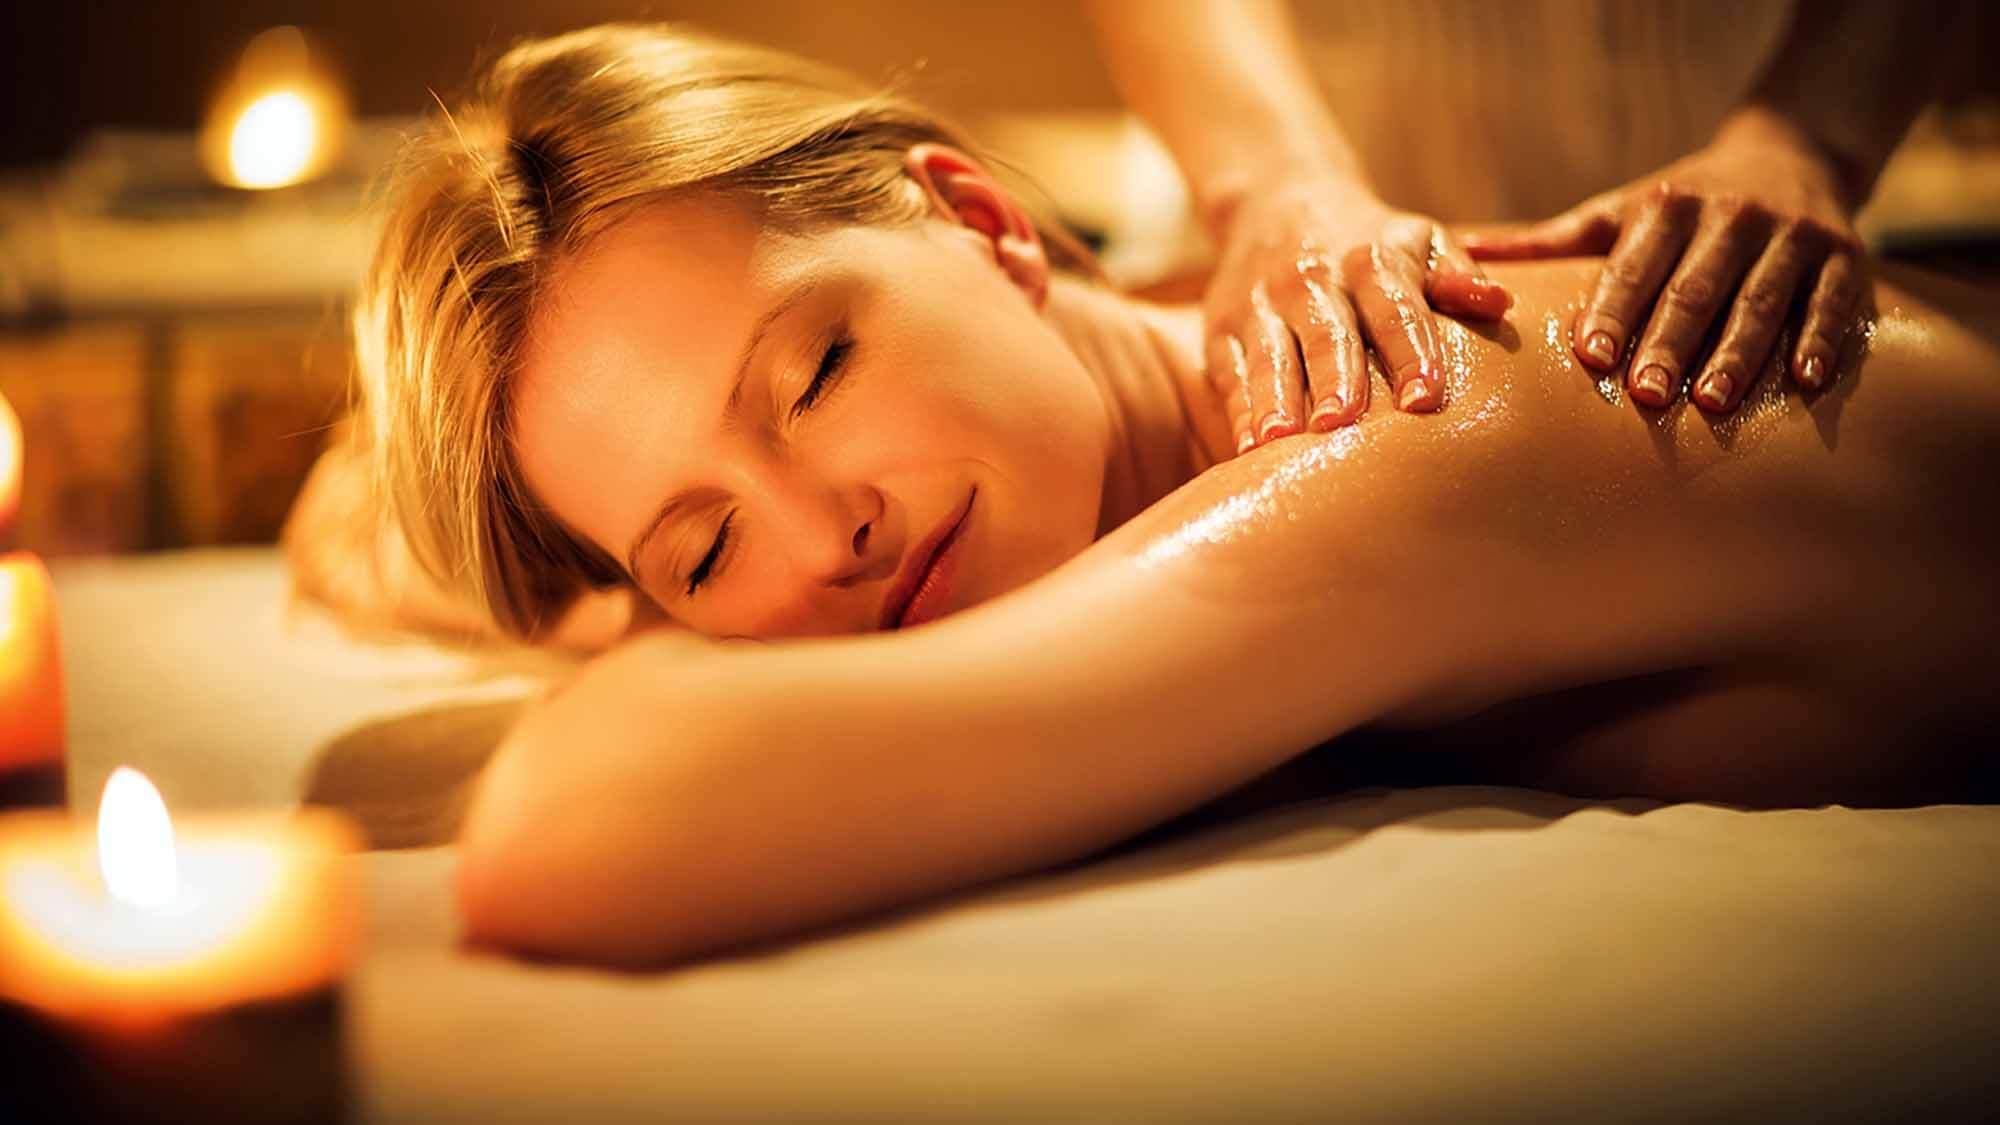 Massage - Luxuria Tours & Events